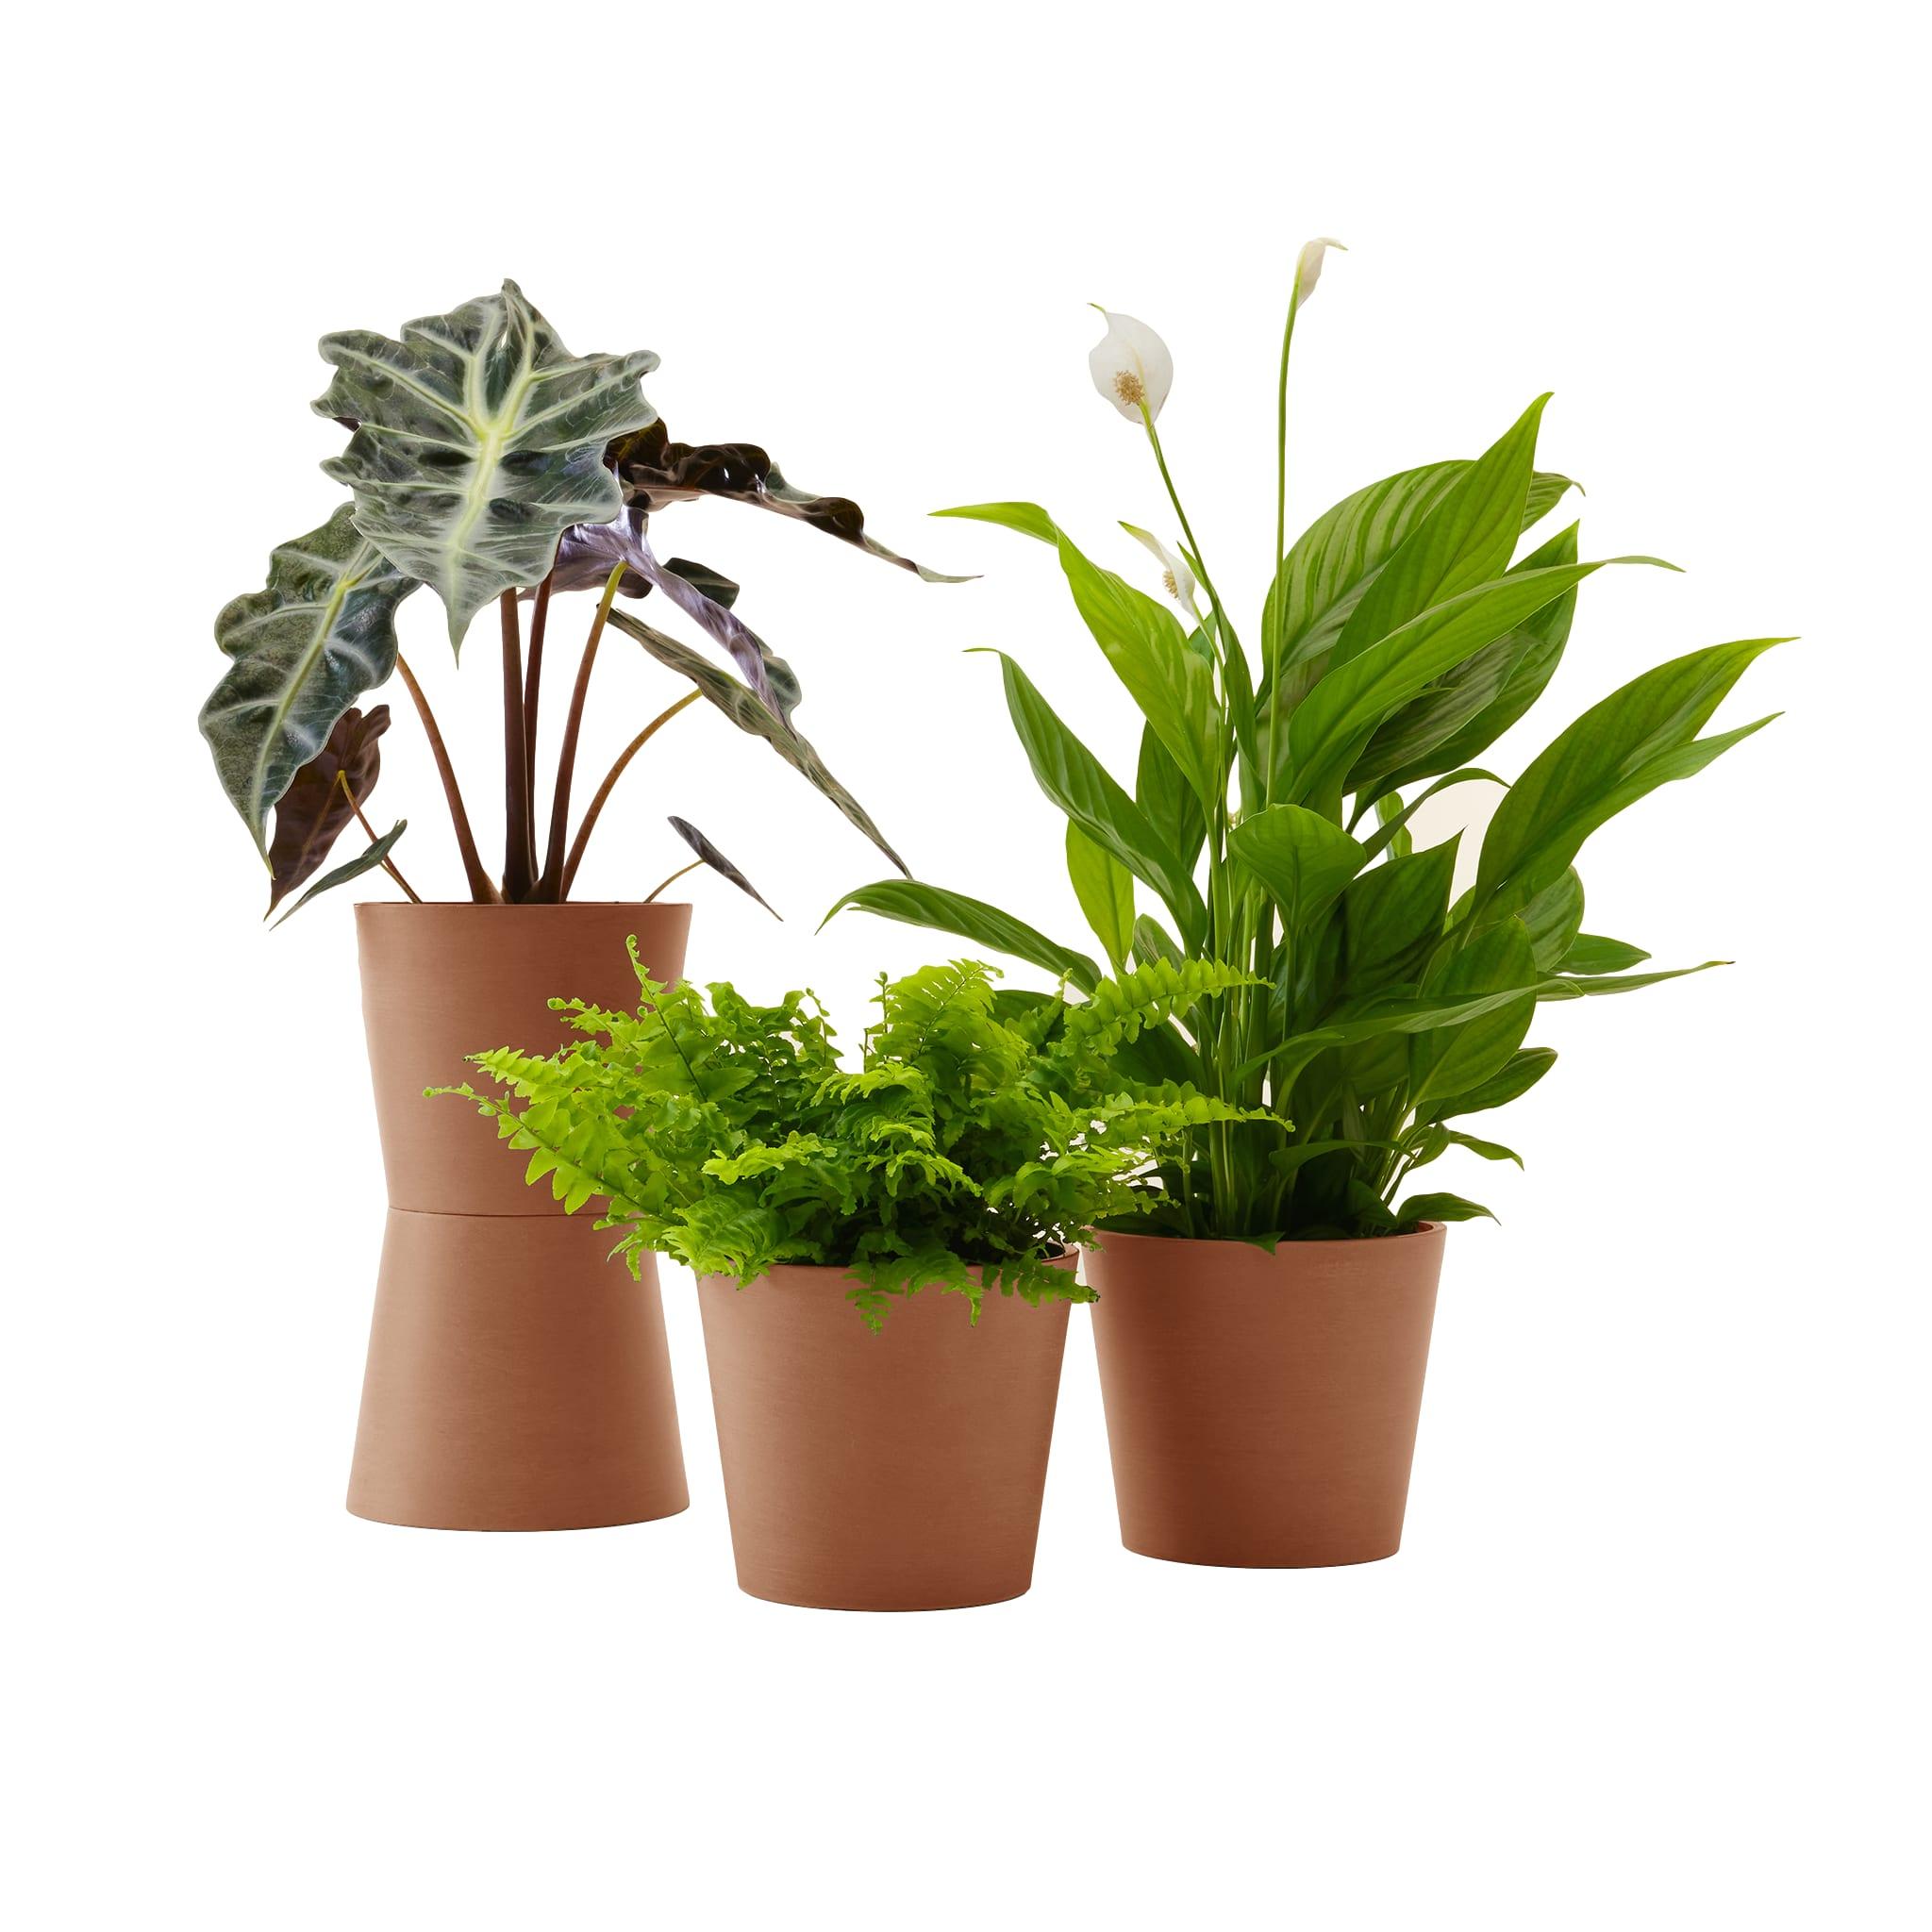 Plante - Spathiphyllum, Bananier, Nephrolepis pot terra